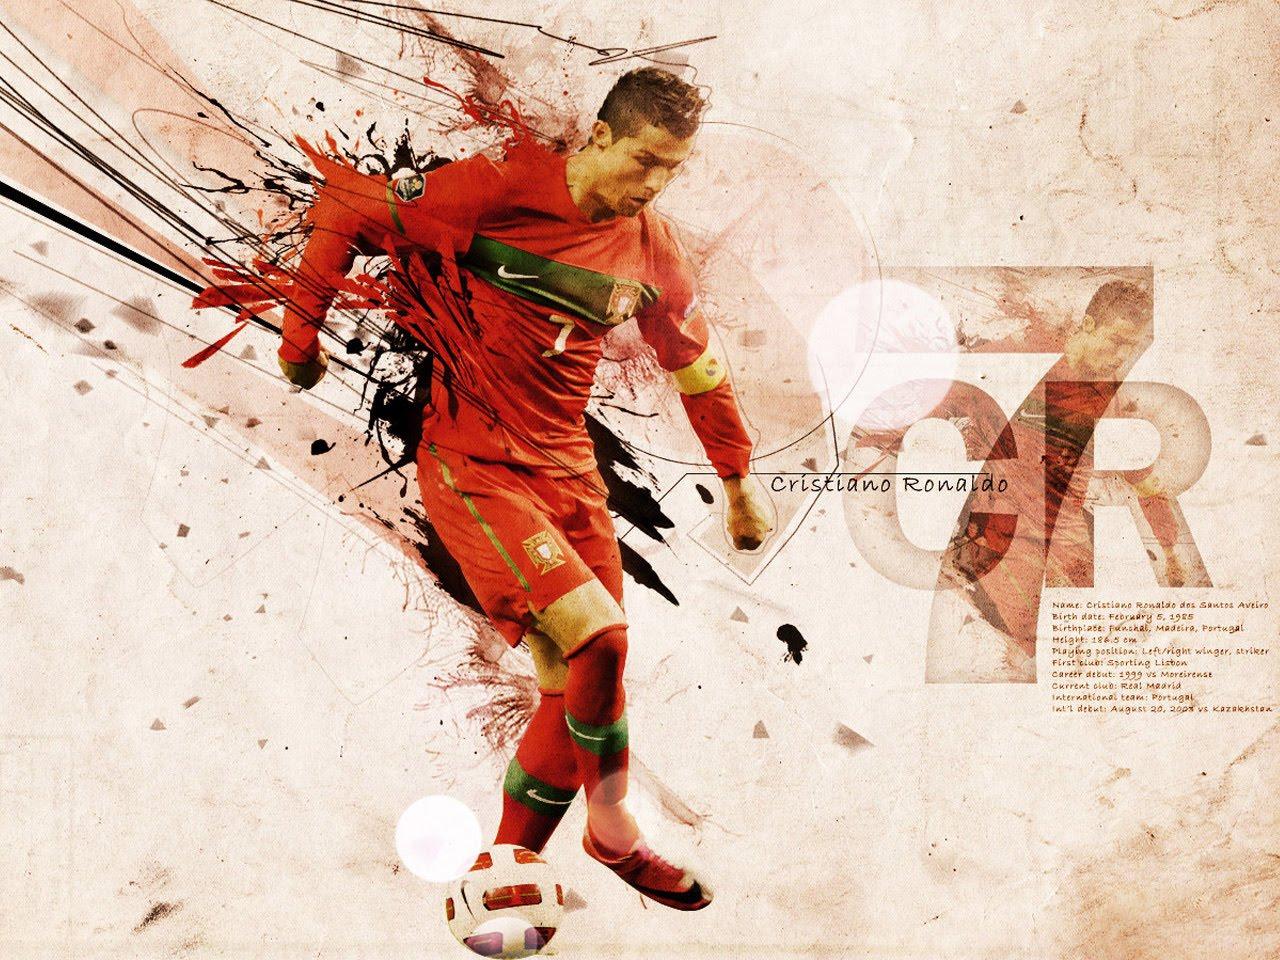 http://3.bp.blogspot.com/-2vyoPVvZpP4/T2axFxifUCI/AAAAAAAAApE/apCvUw_B_K0/s1600/cristiano-ronaldo-Portugal-2012%252Bwallpaper.jpg